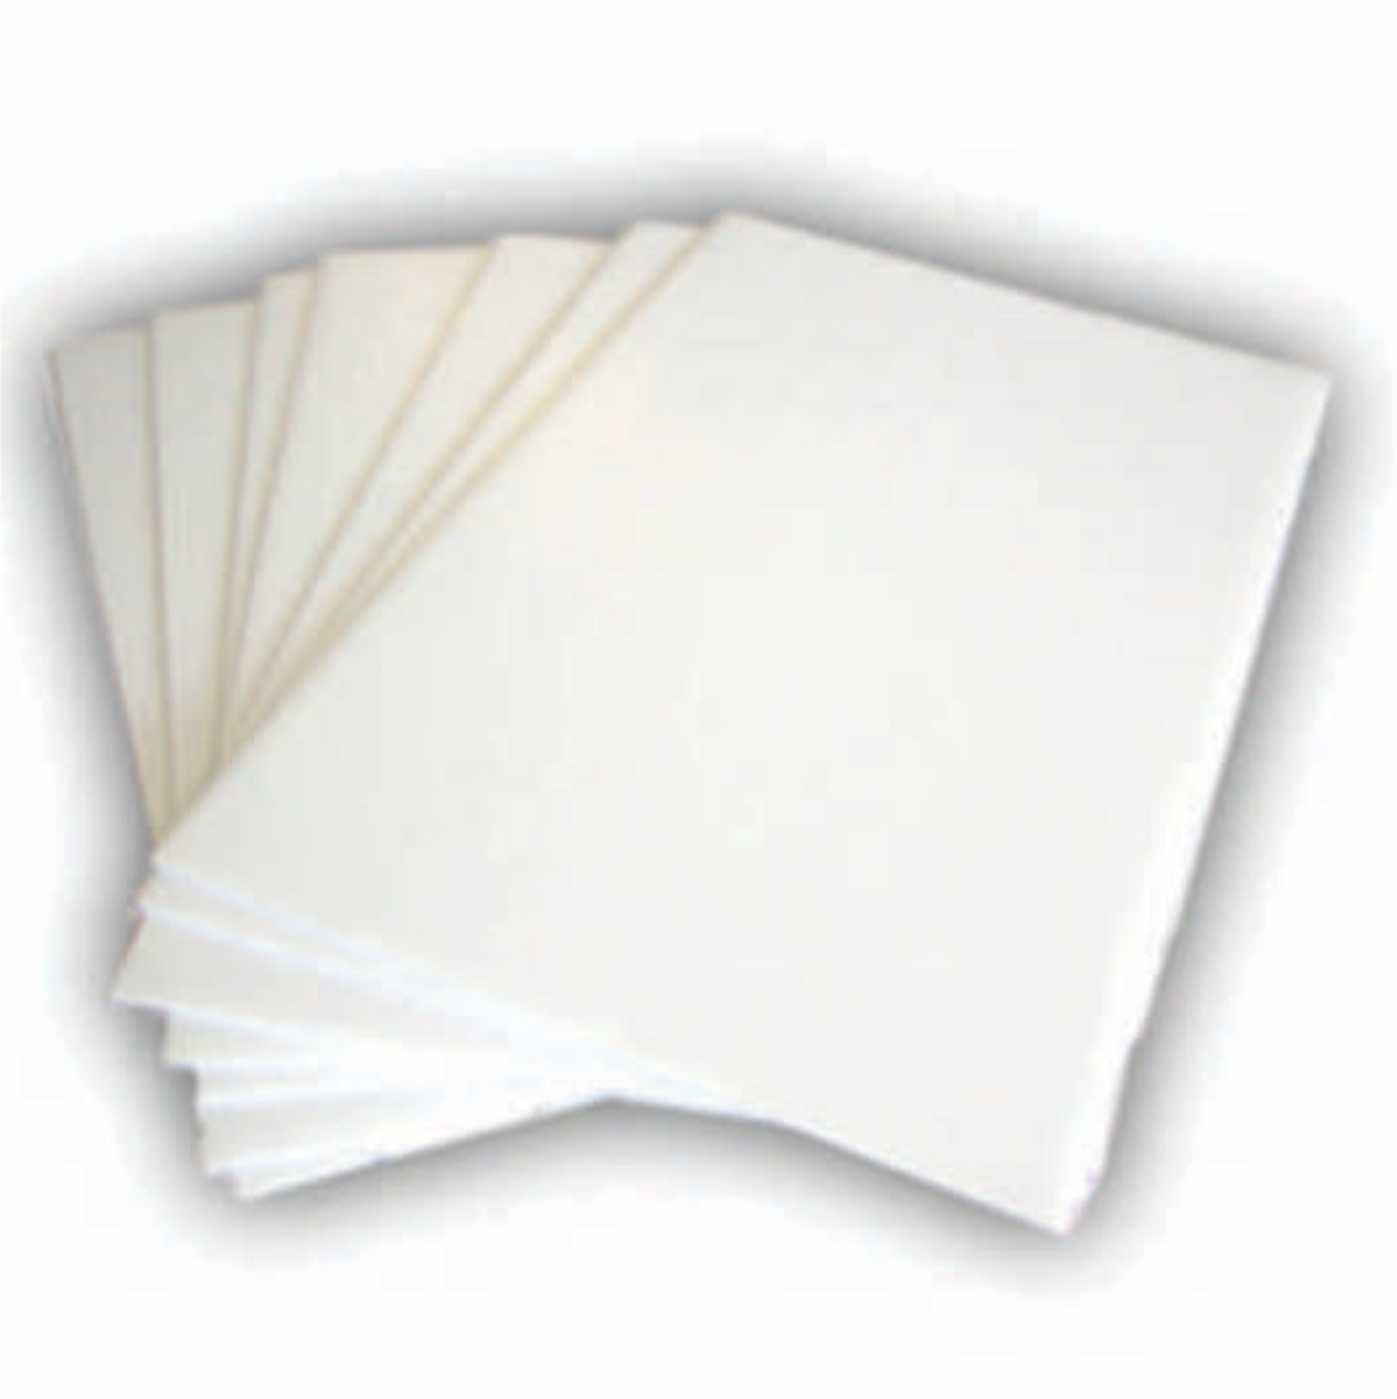 "Pack 100 18x24"" Plastic Corrugated 4mm WHITE Yard Bandit Sig"